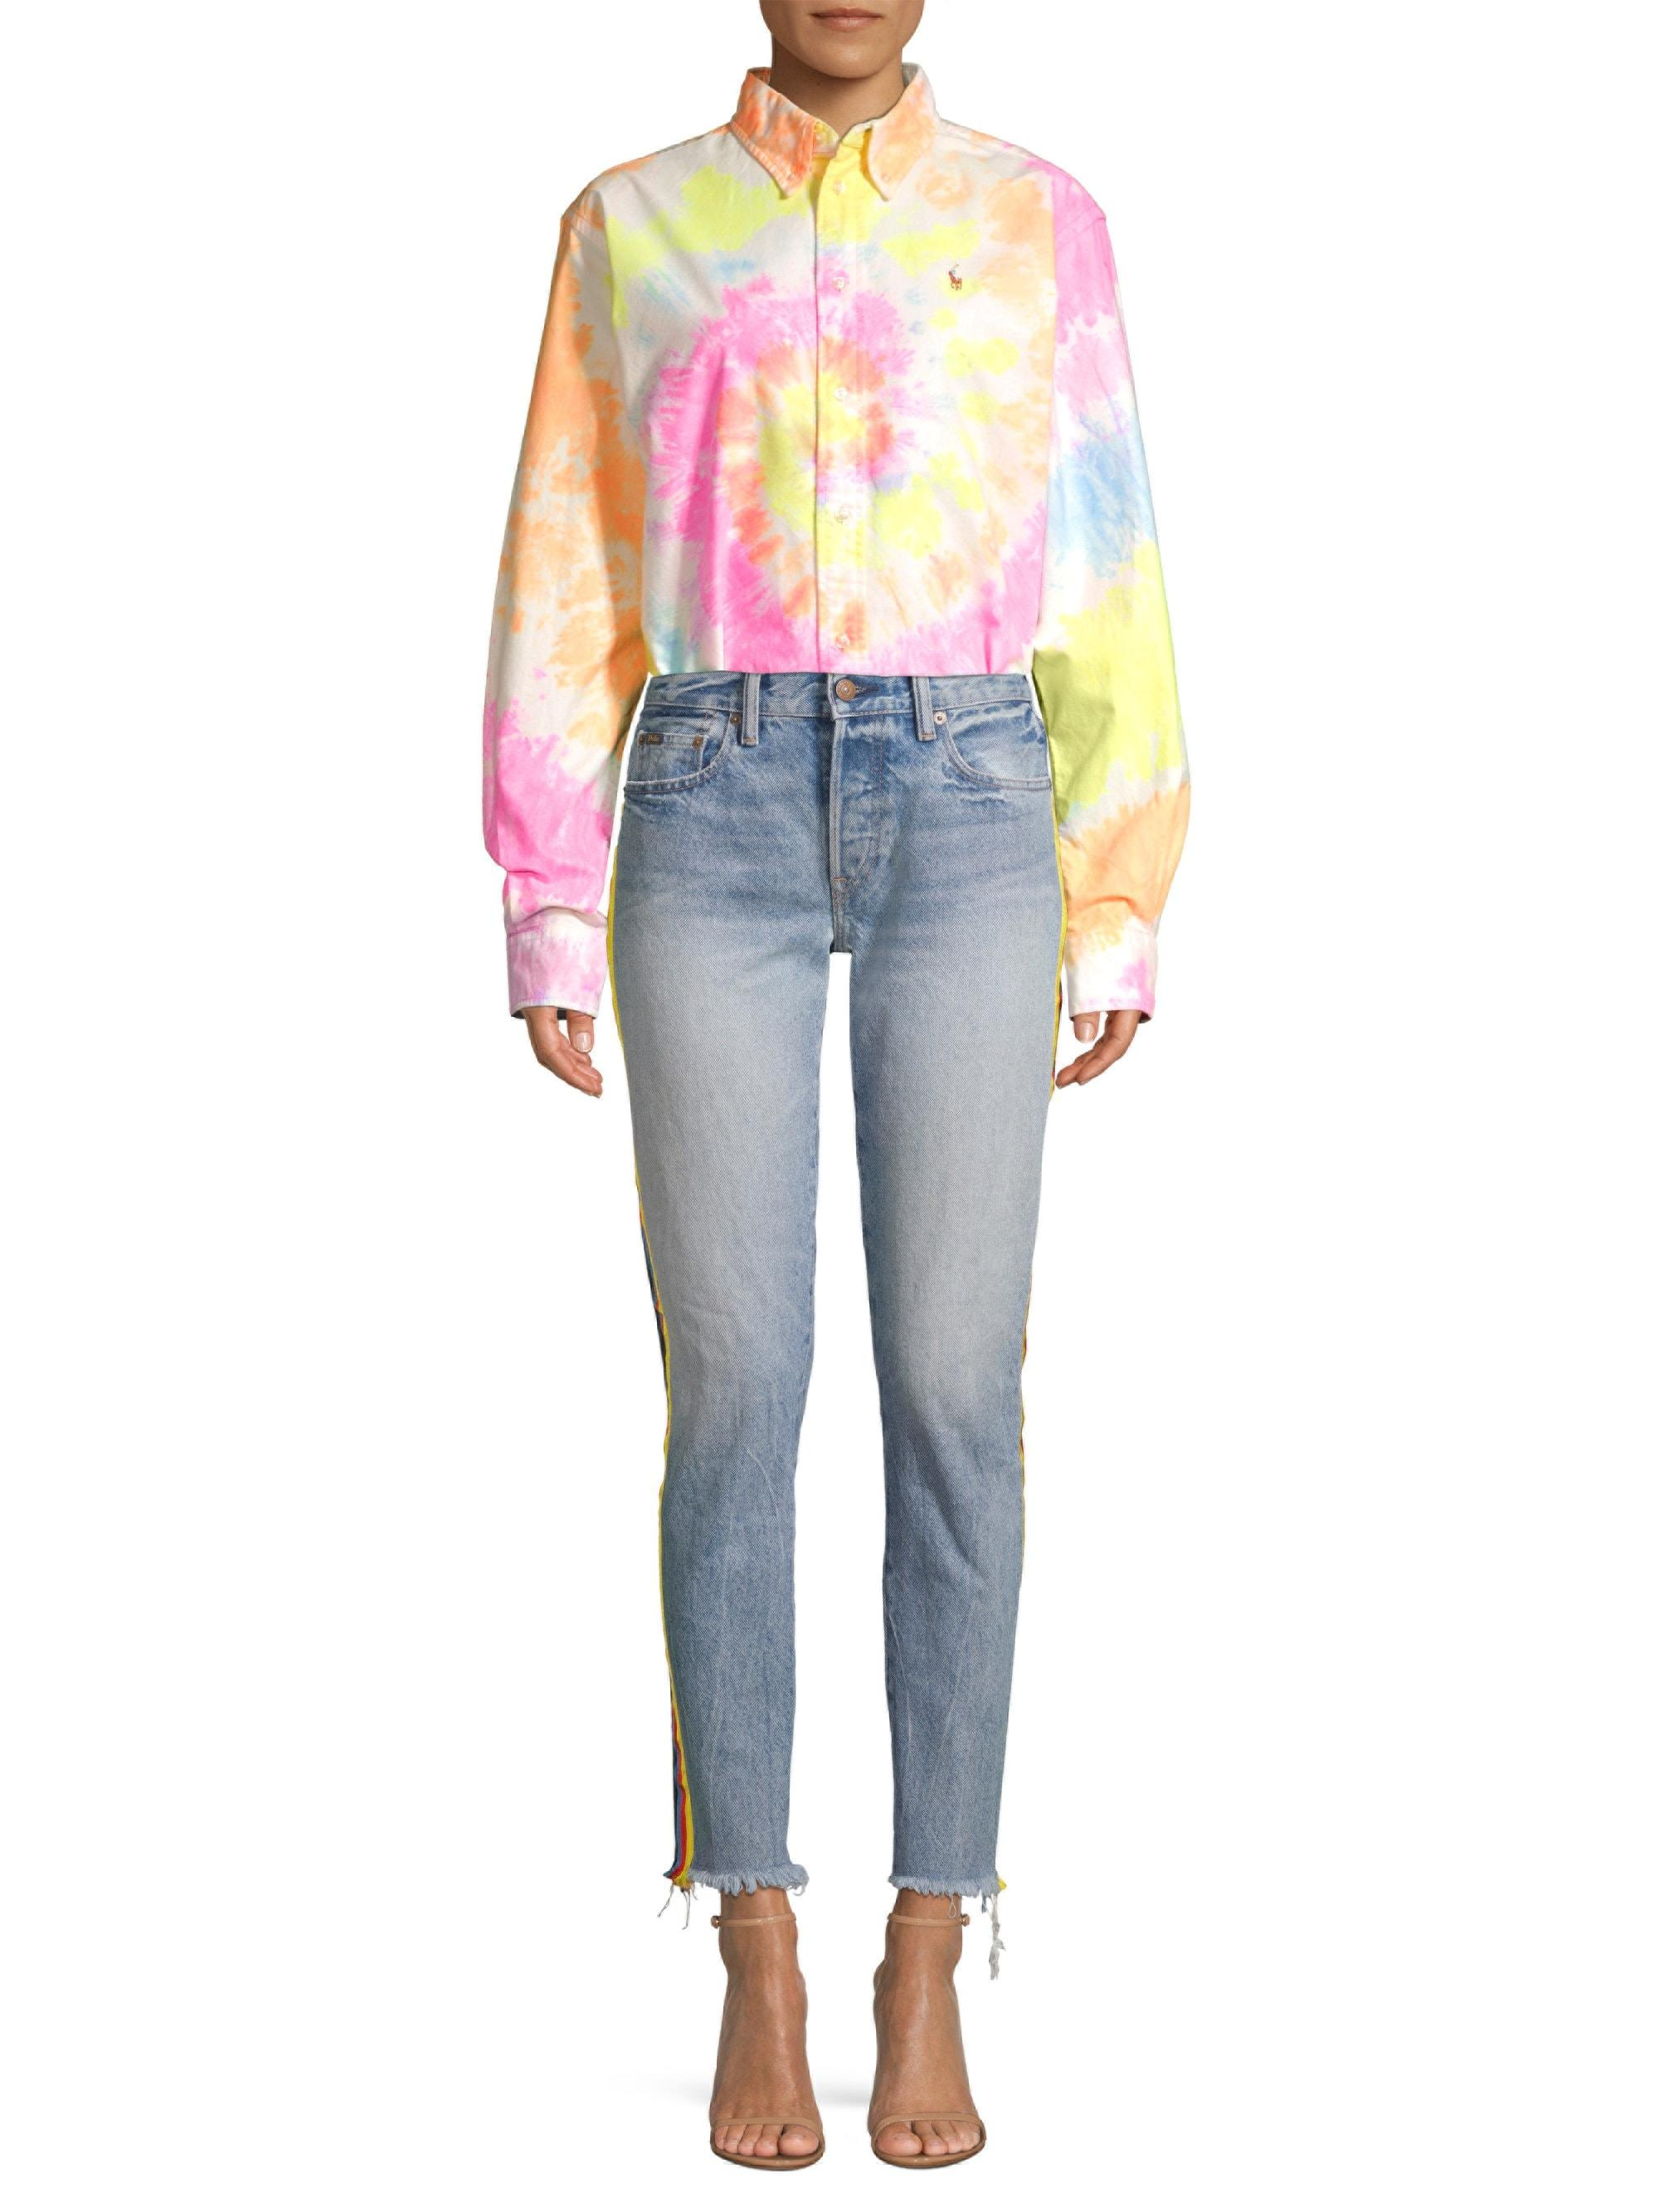 b72d8872 Polo Ralph Lauren Tie-dye Long-sleeve Shirt in Pink - Lyst